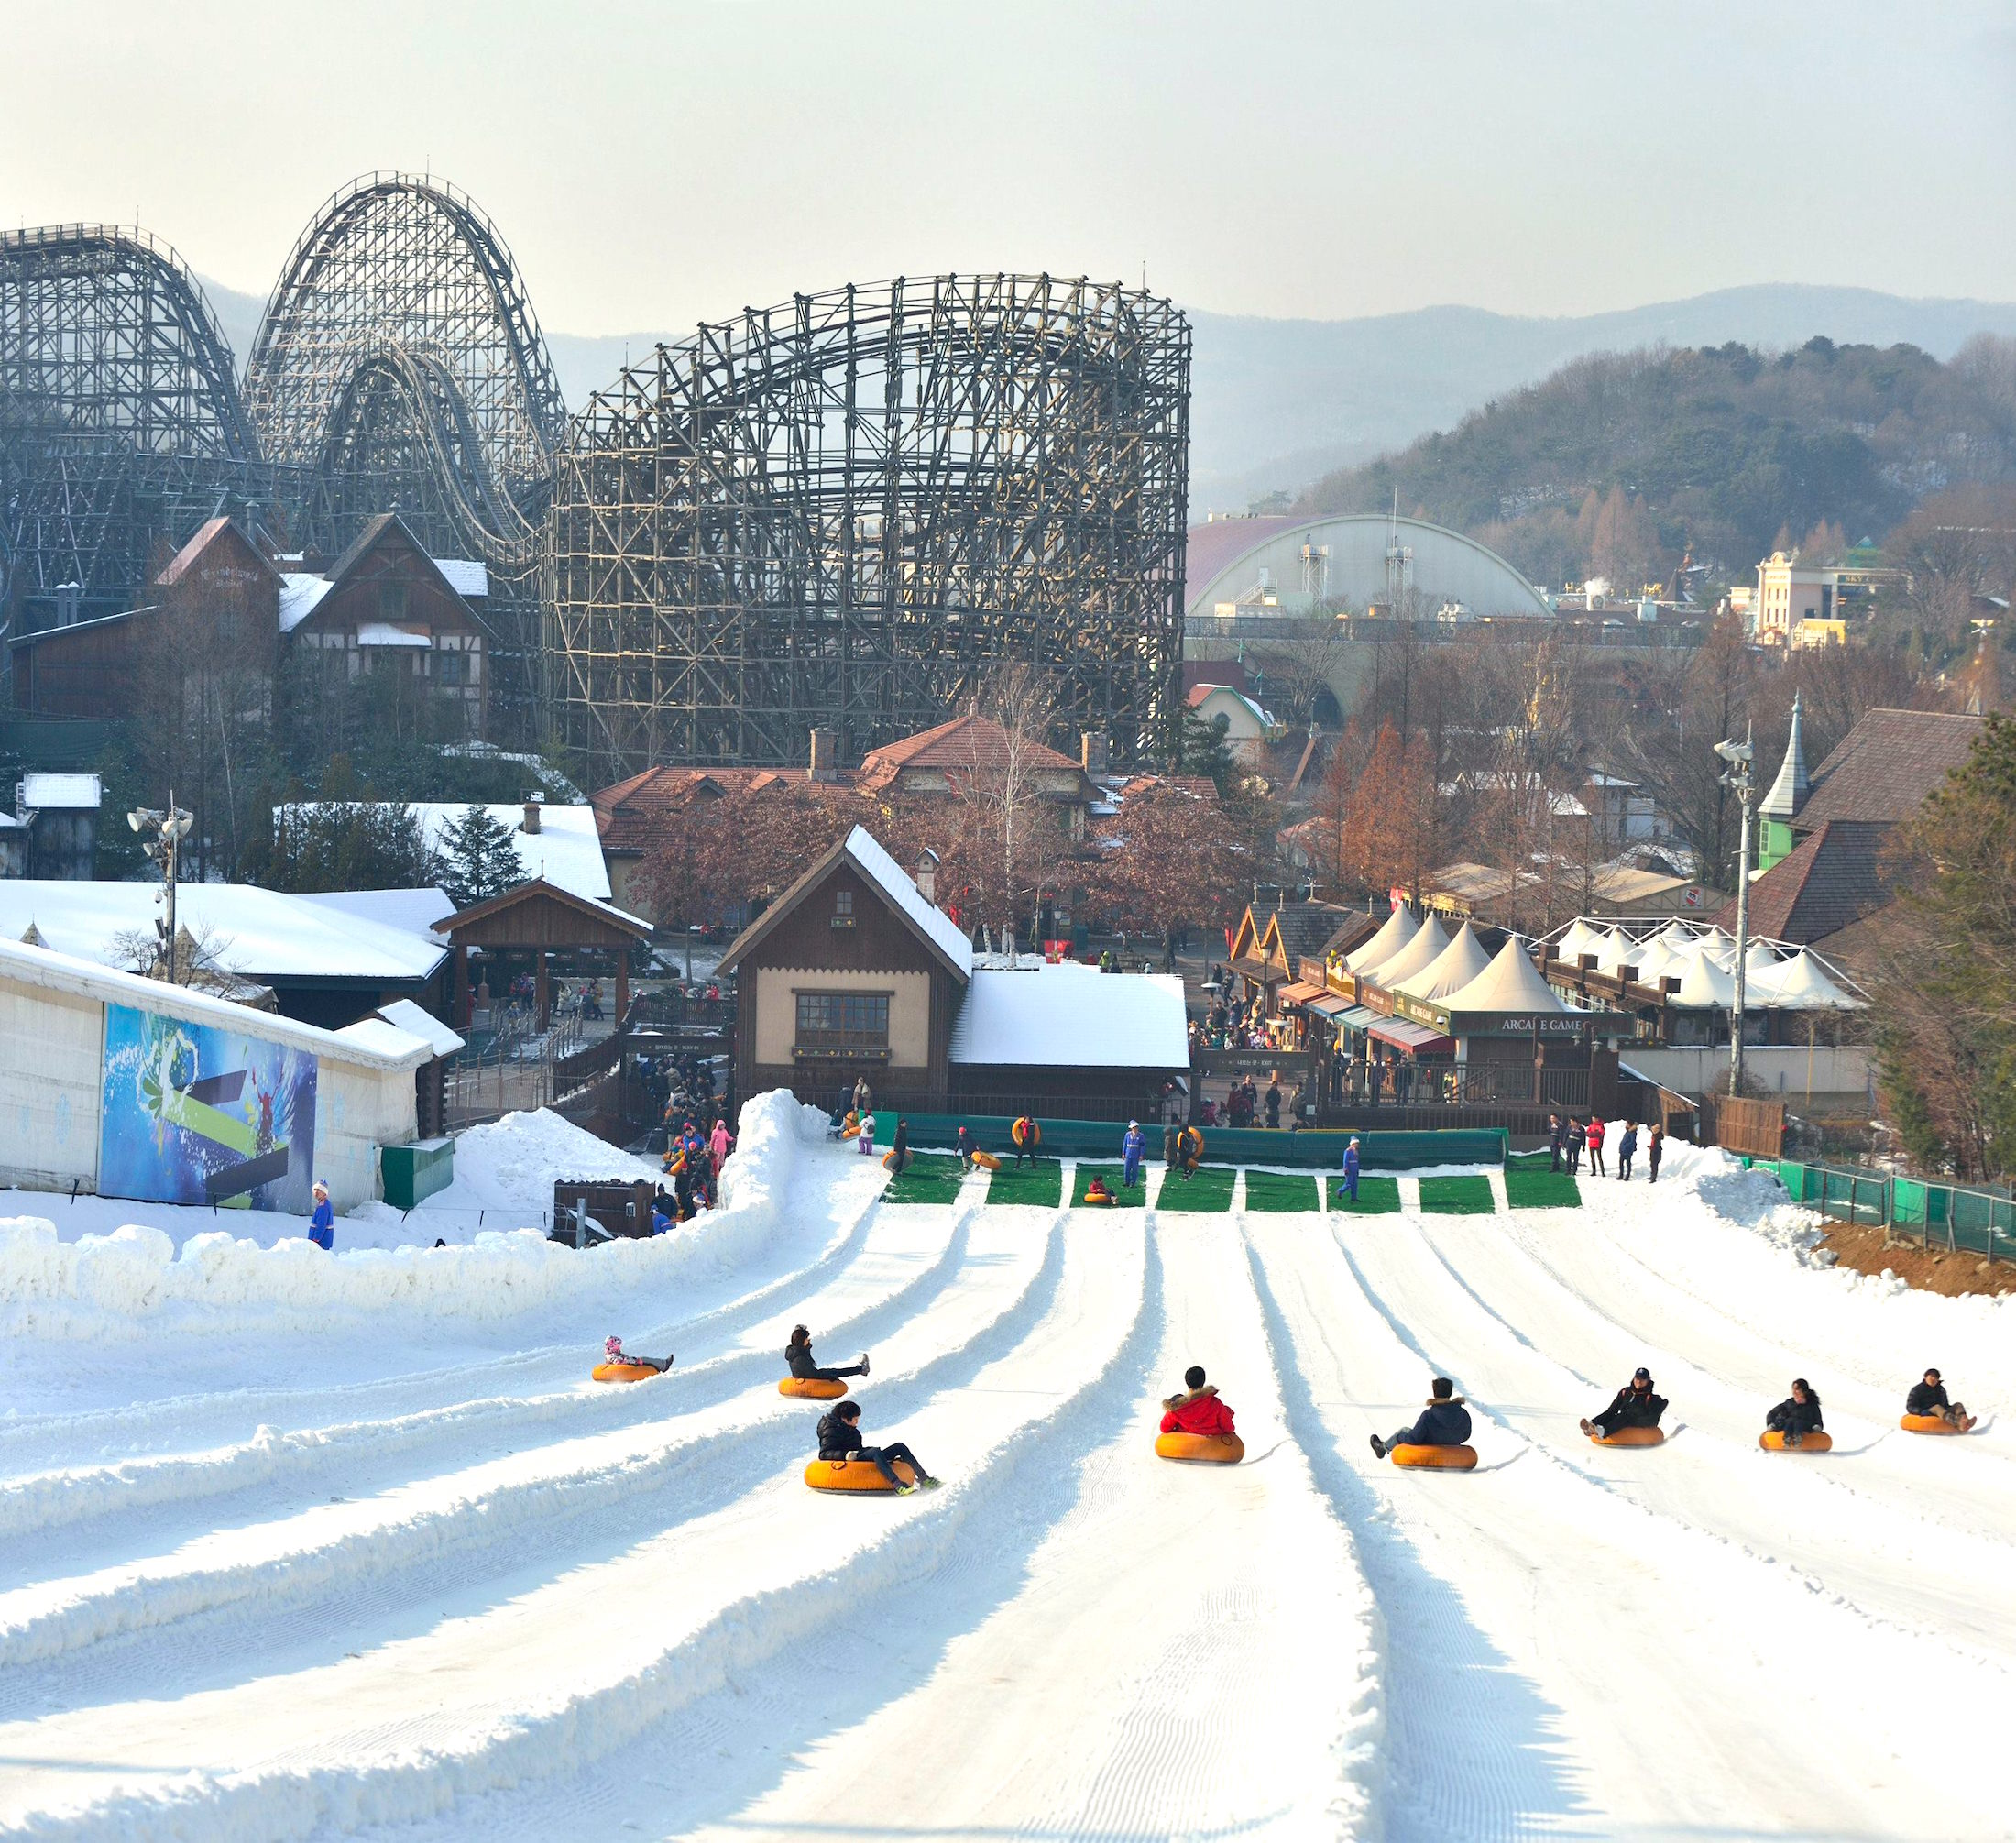 Korea Everland Theme Park Admission Ticket (Express 'Q Pass' Tickets Available)-KKday.com